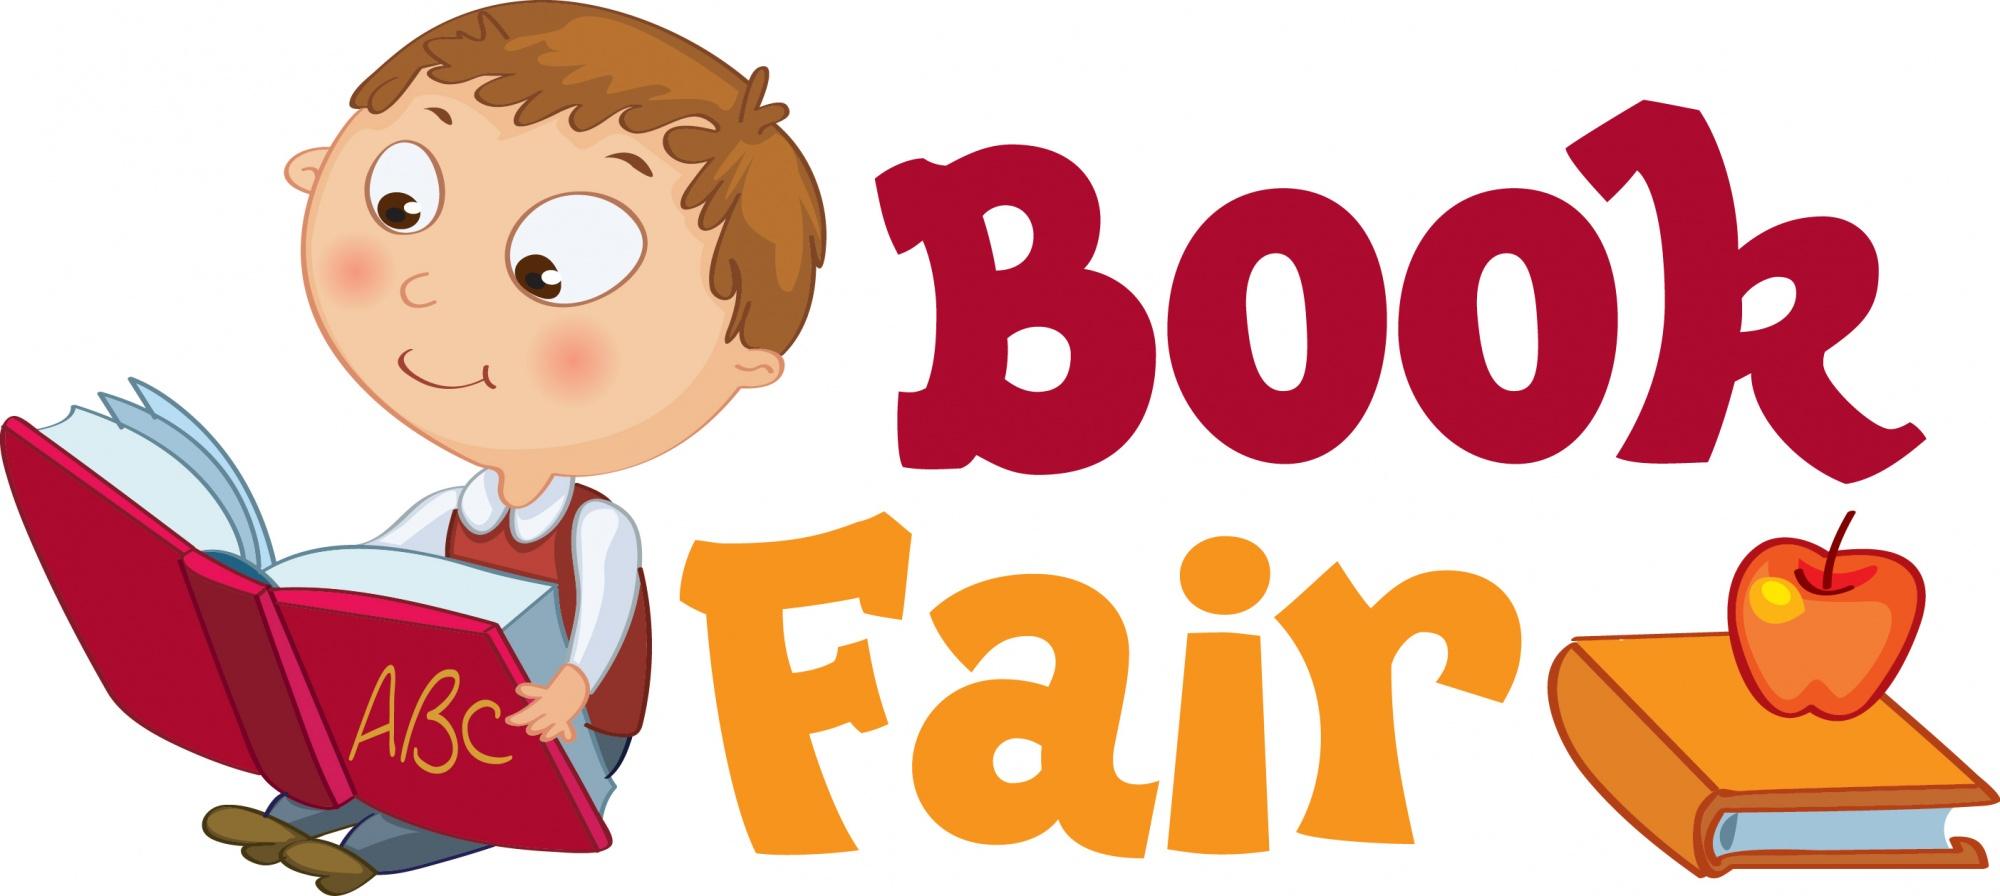 book fair volunteers needed proctor pto rh proctorpto com bookaneer book fair clipart bogo book fair clipart